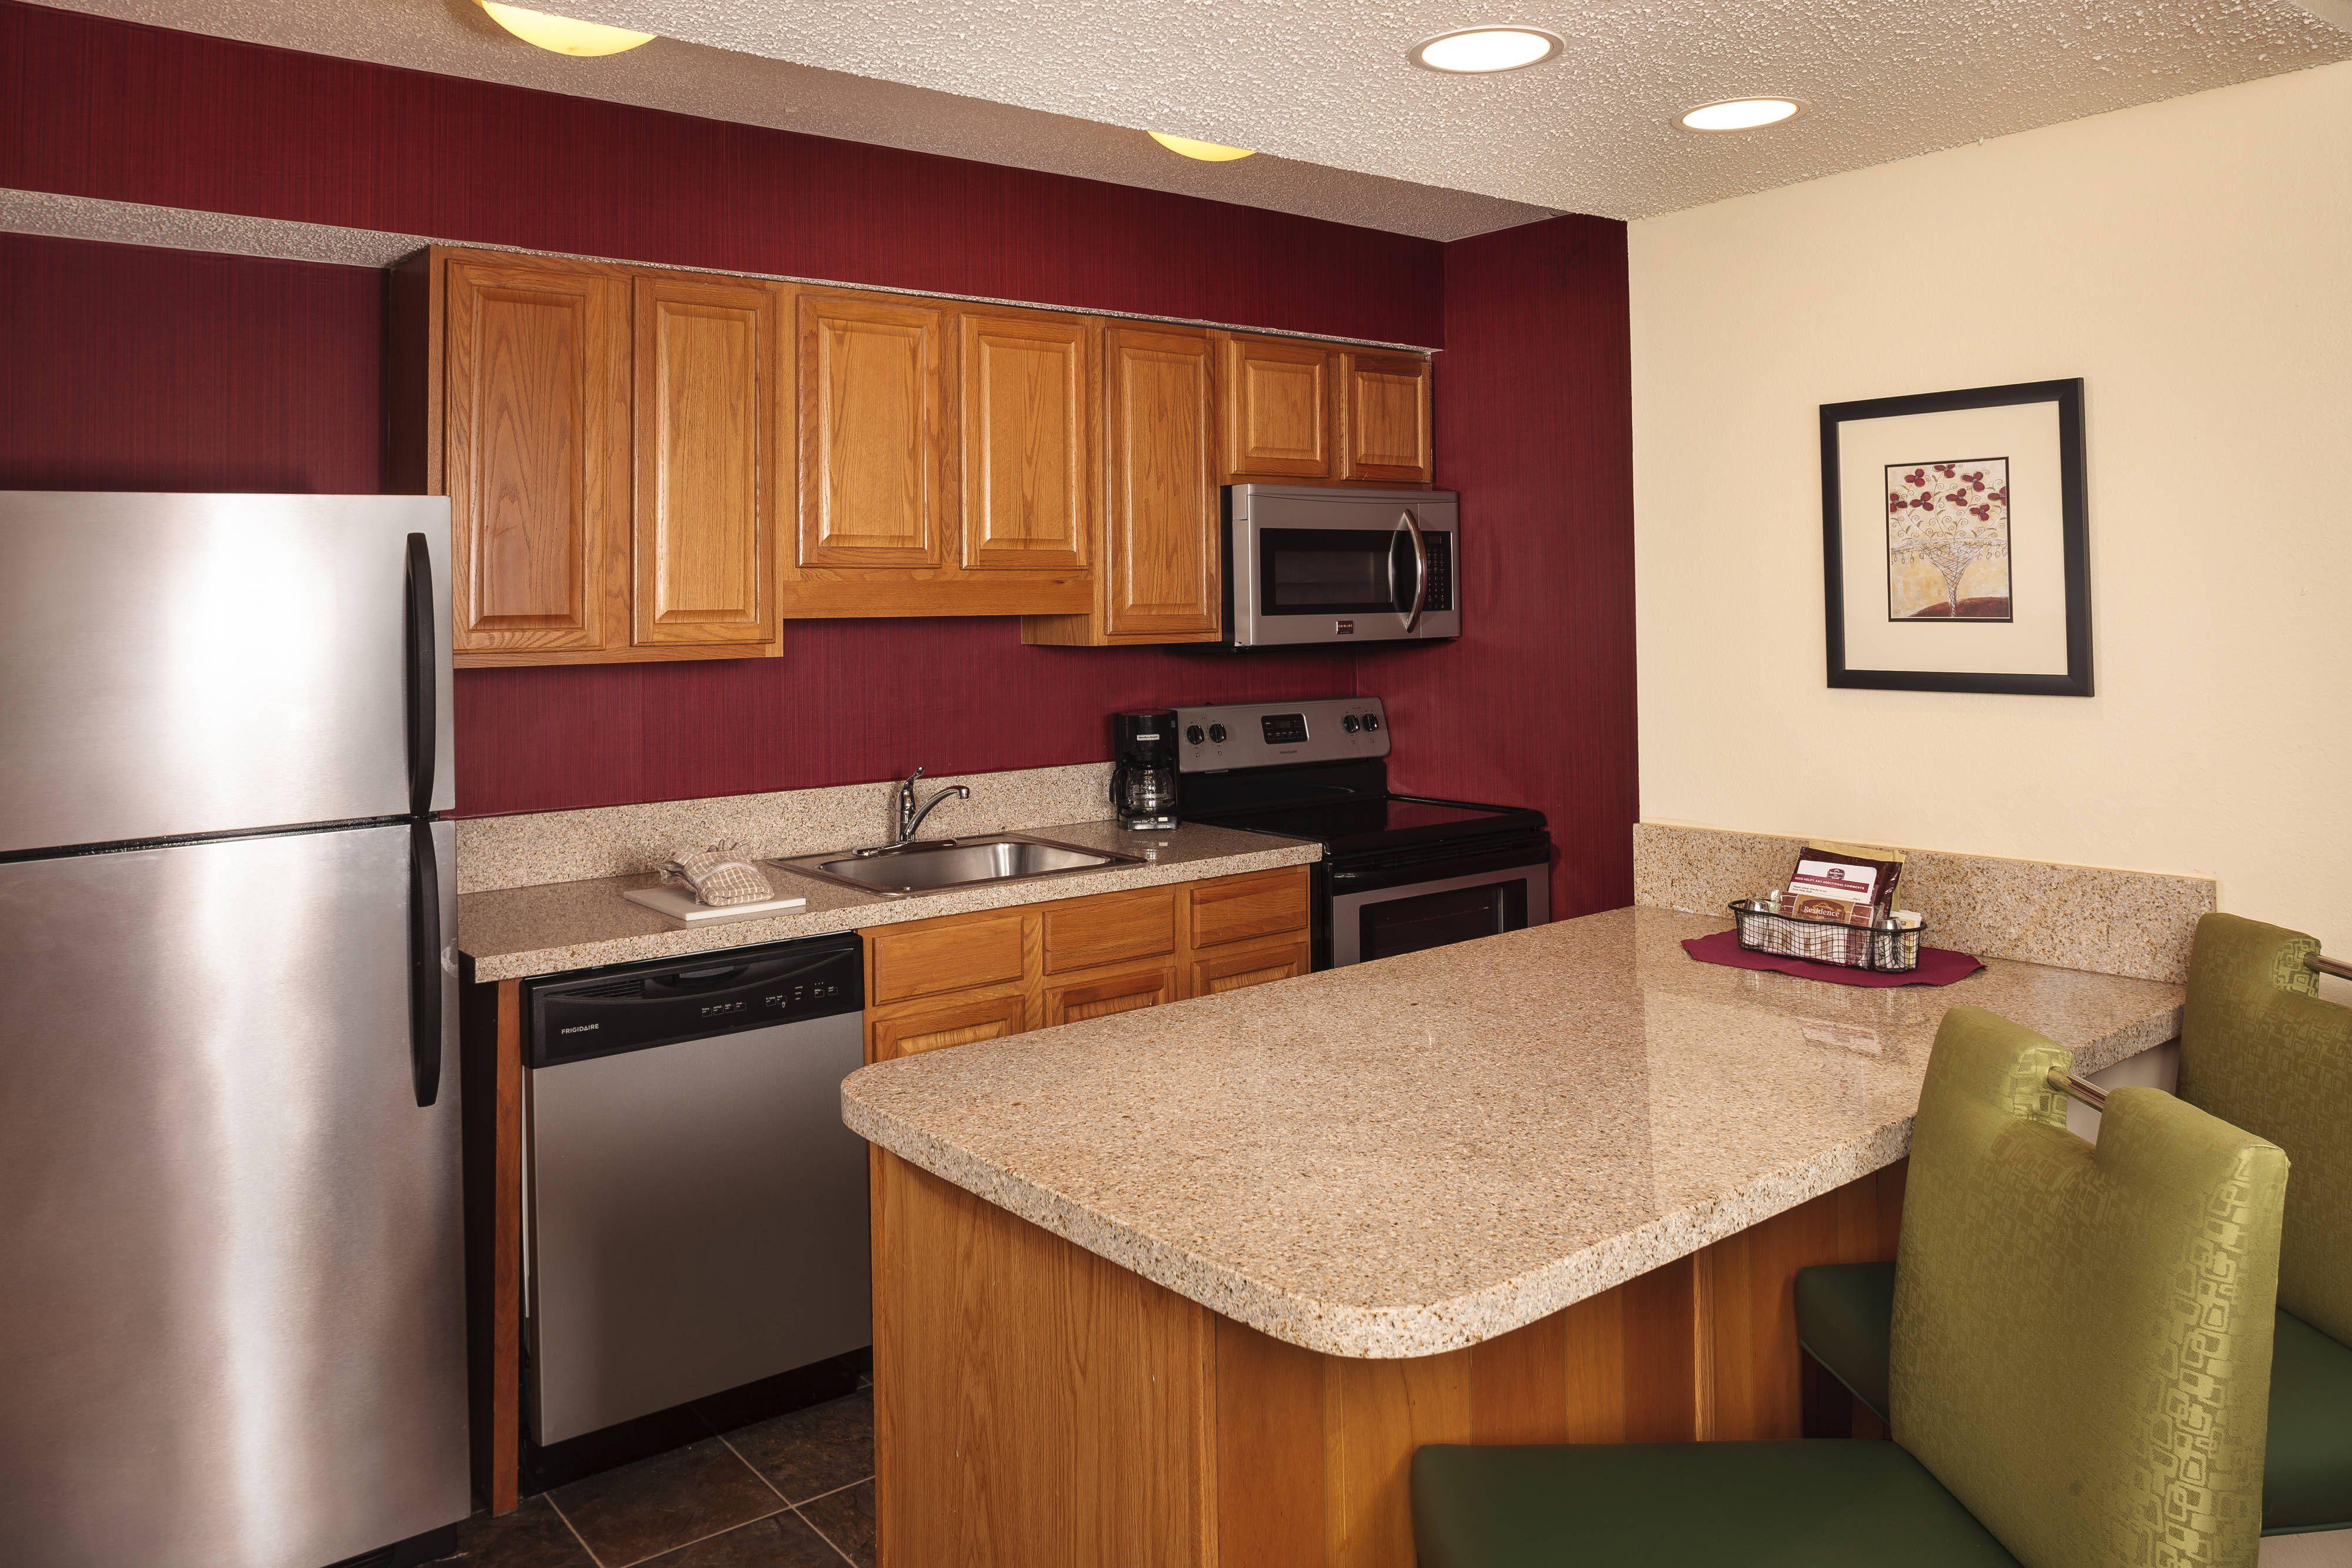 Residence Inn Binghamton Suite Kitchen Enjoy Enjoying Hotel Kitchen Home Decor Residences